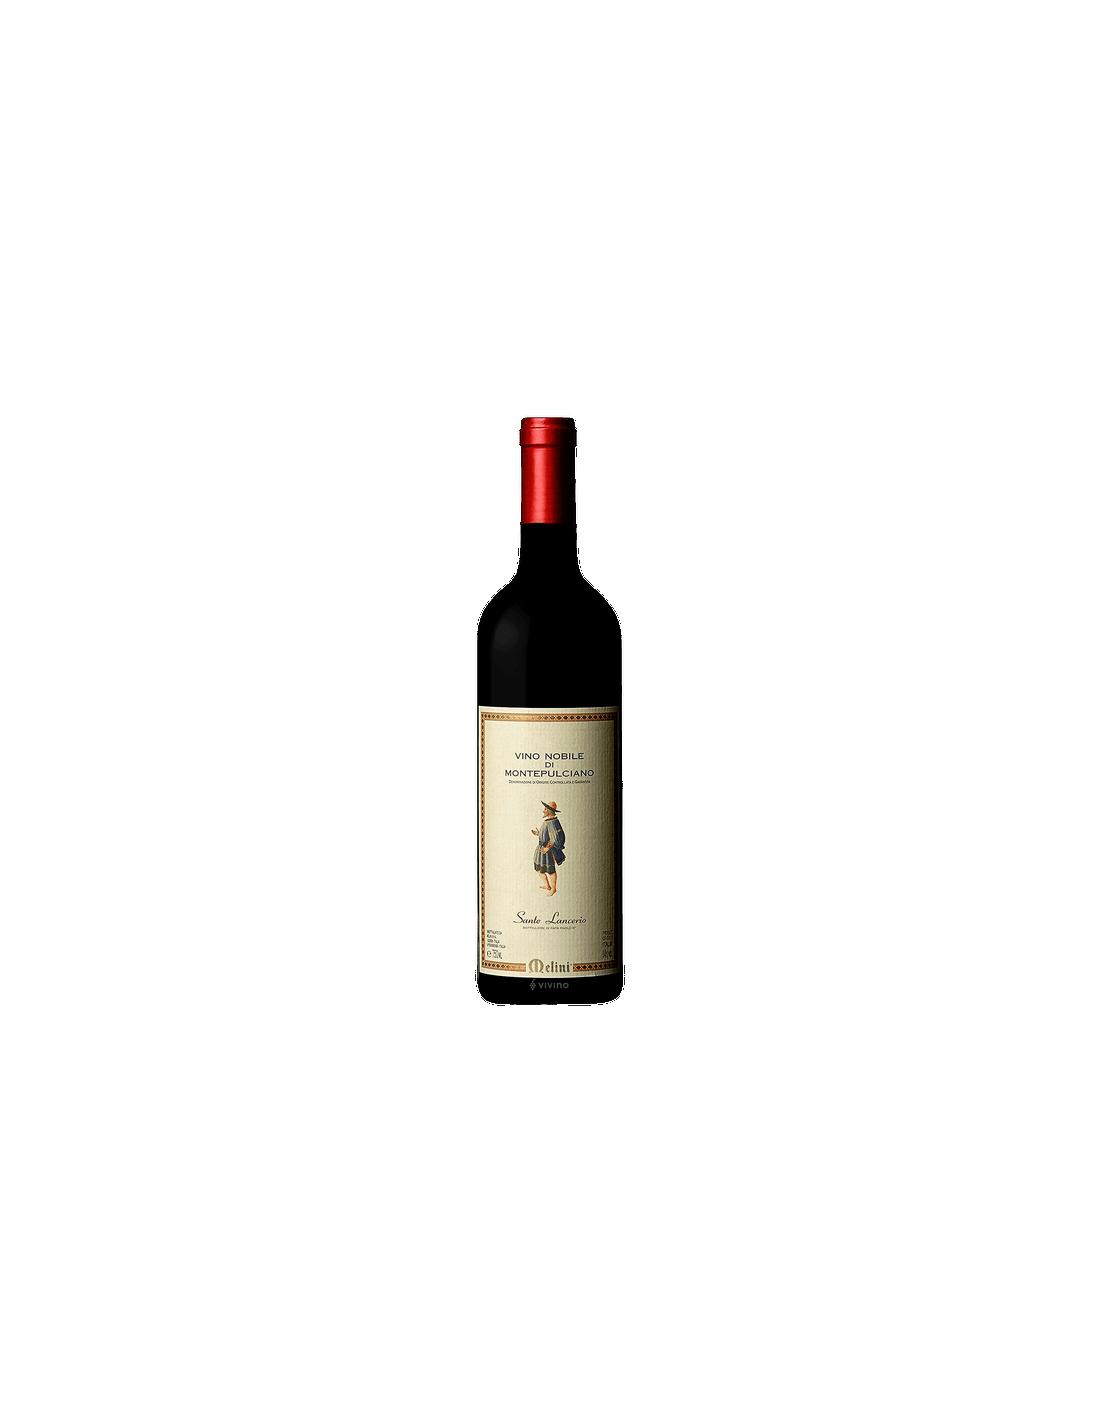 Vin rosu Melini Sante Lancerino Montepulciano, 13.5% alc., 0.75L, Italia